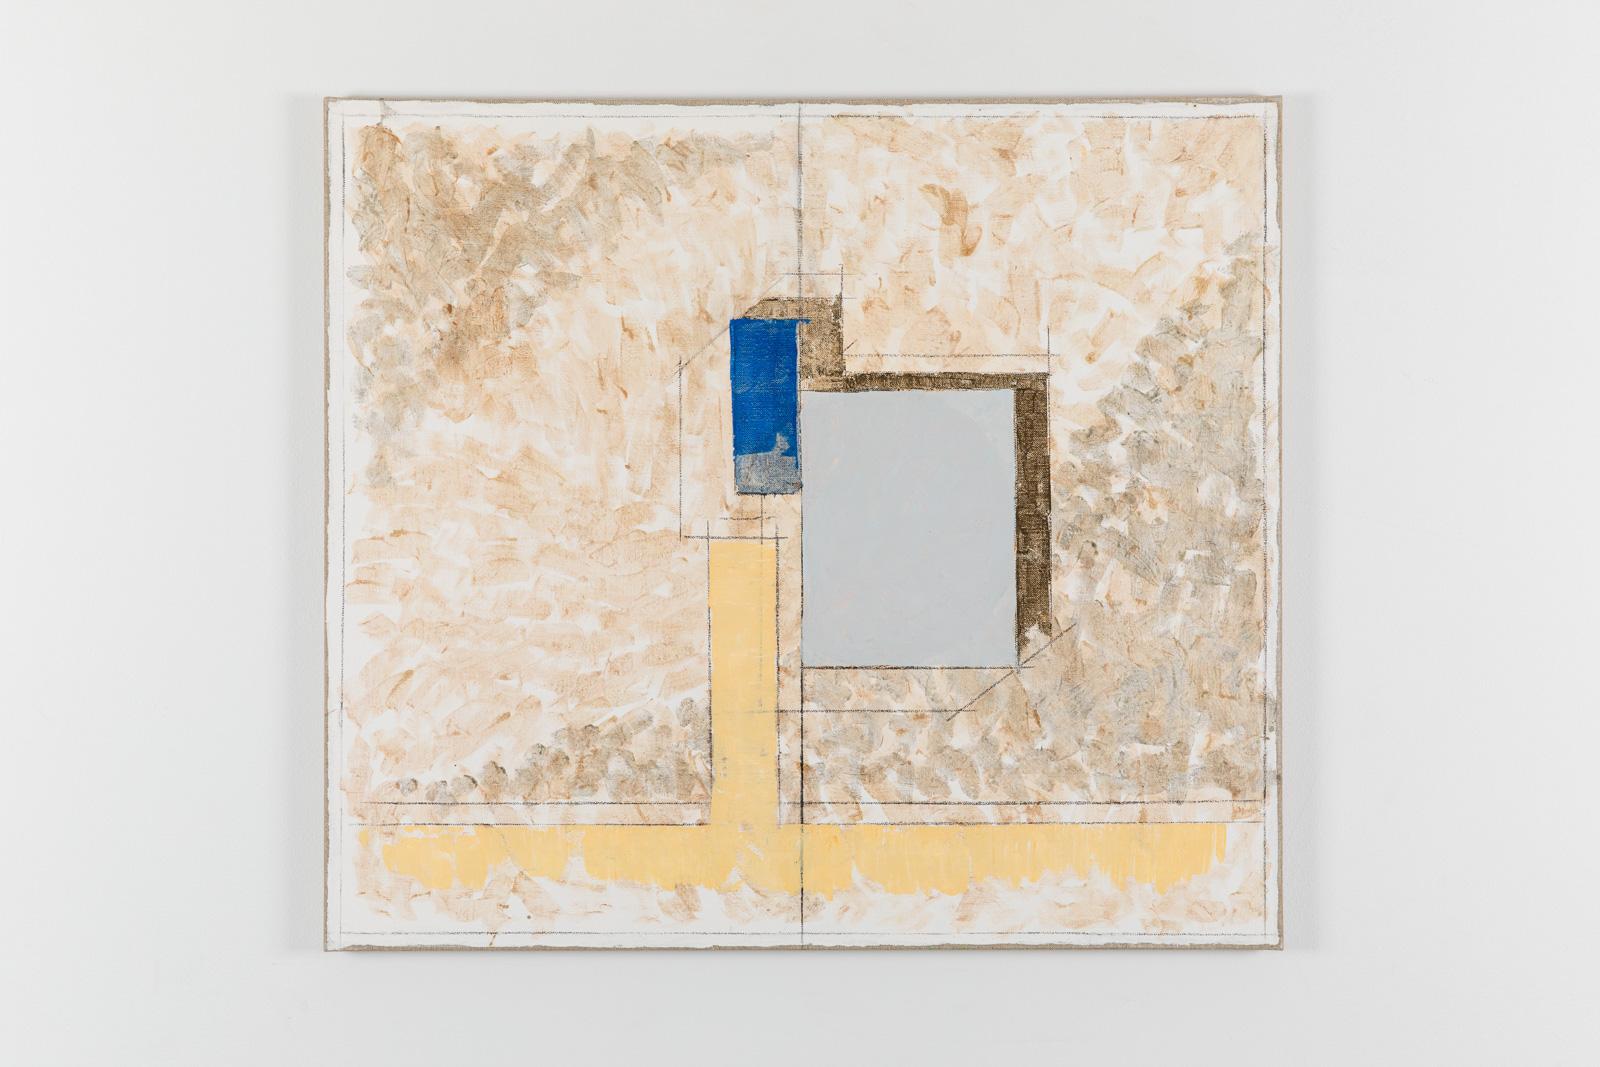 Vila Ziza 22, 2018, Egg tempera on canvas, 80 x 90 cm